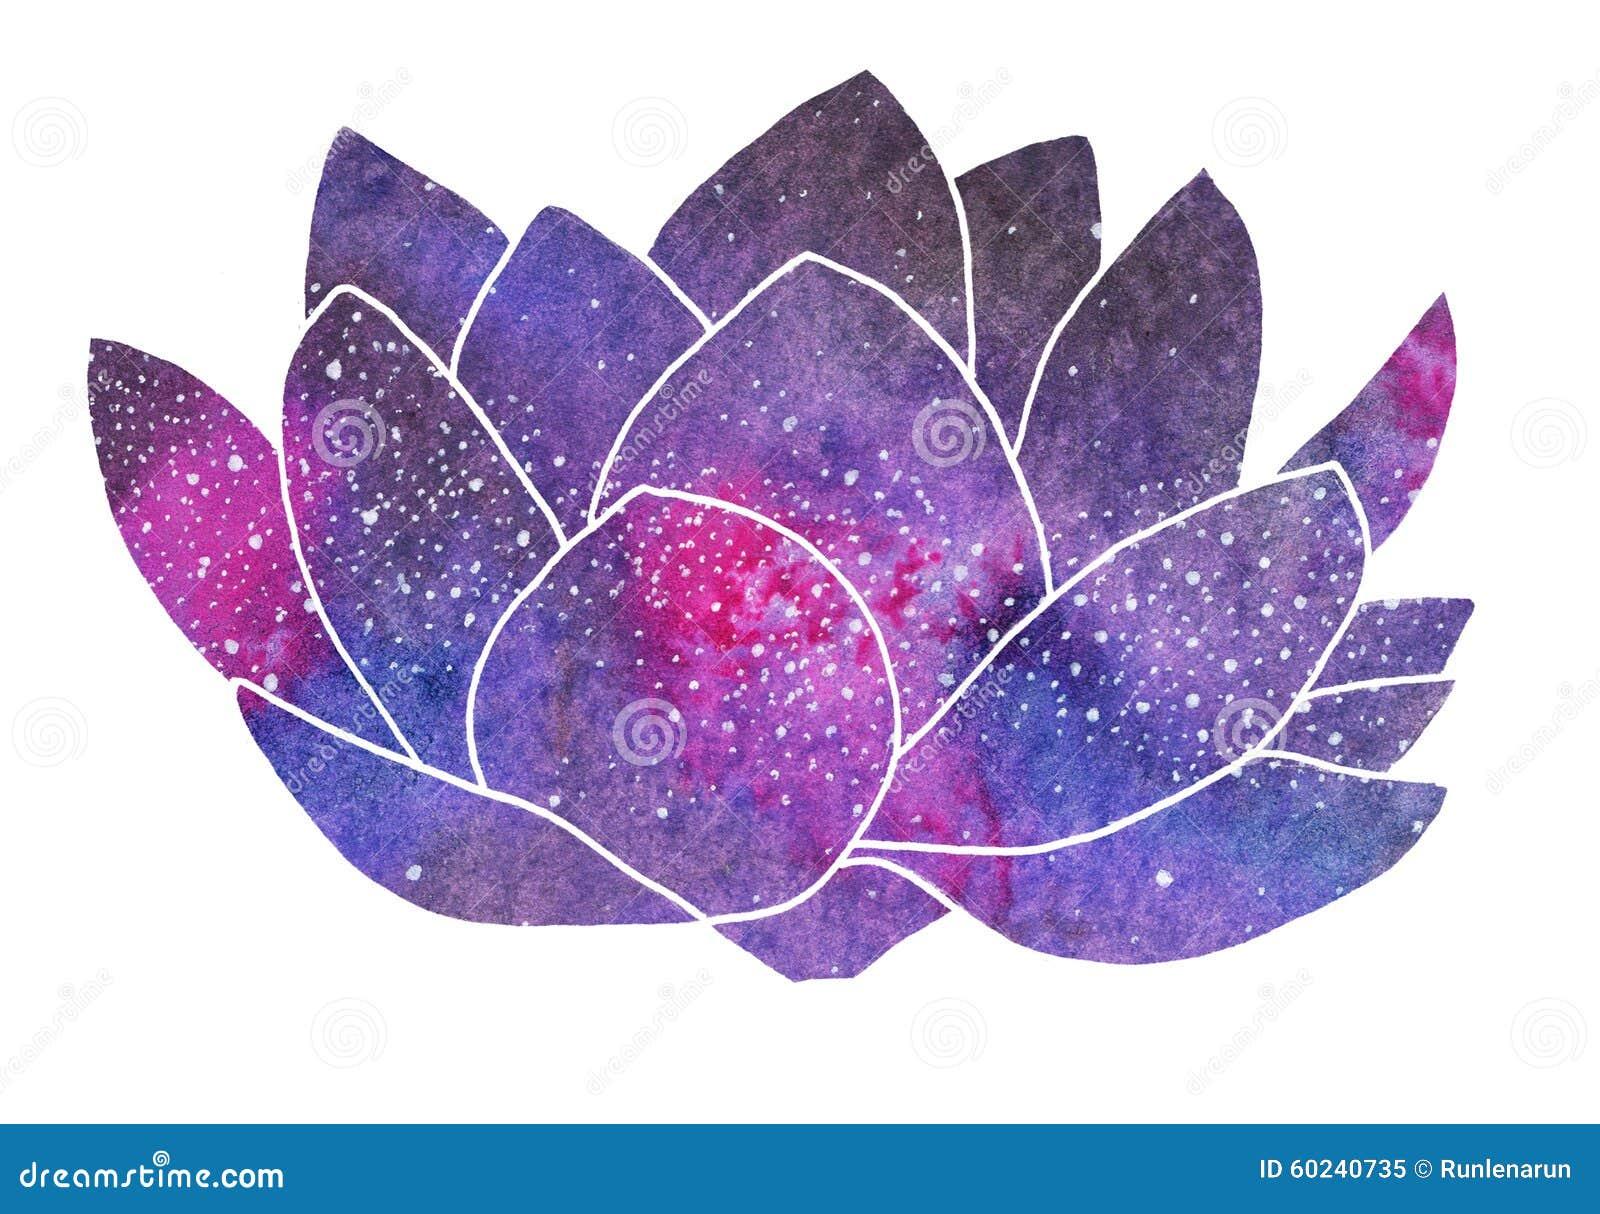 Galaxy lotus. Hand-drawn cosmic flower